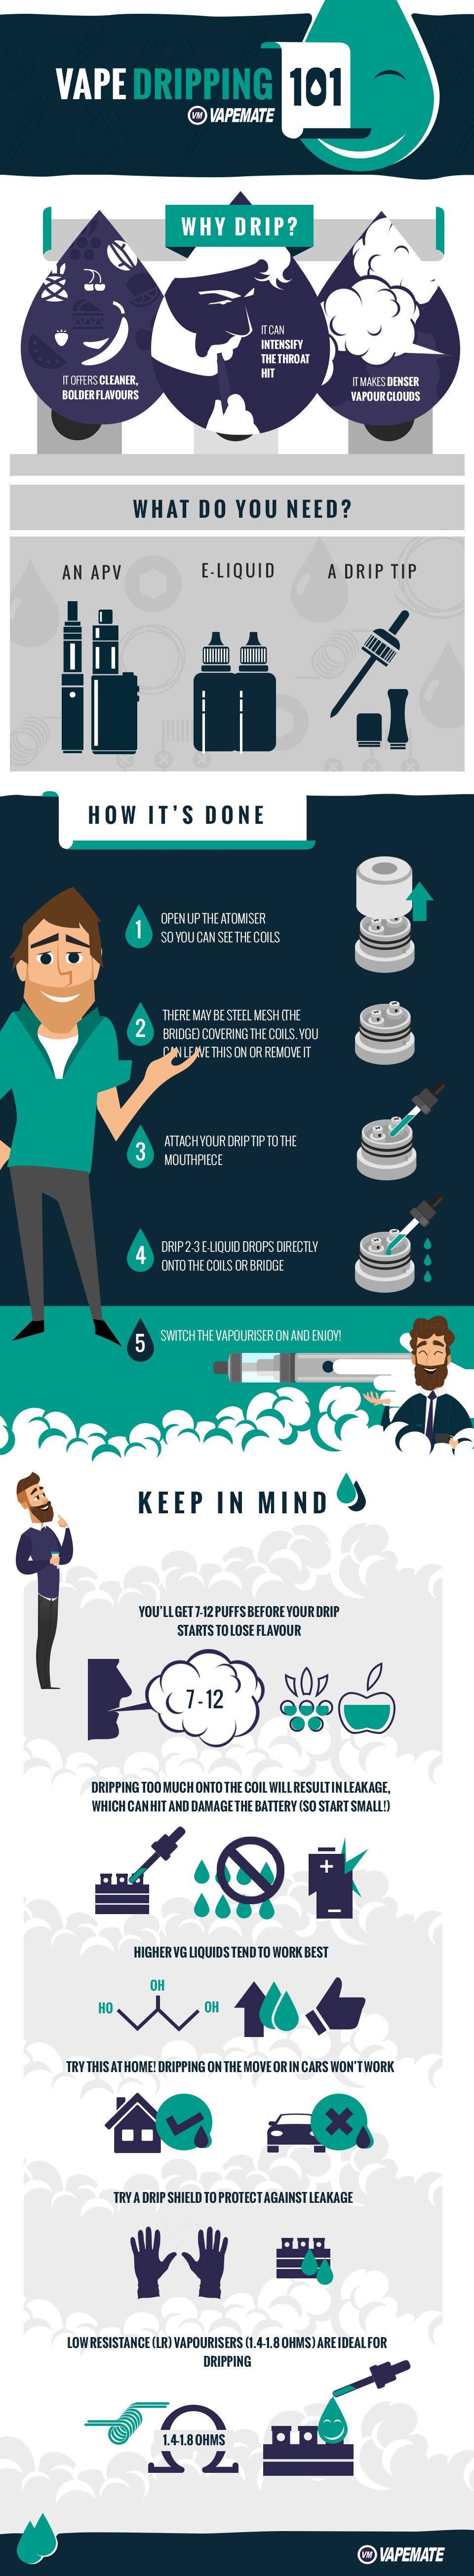 vape dripping infographic